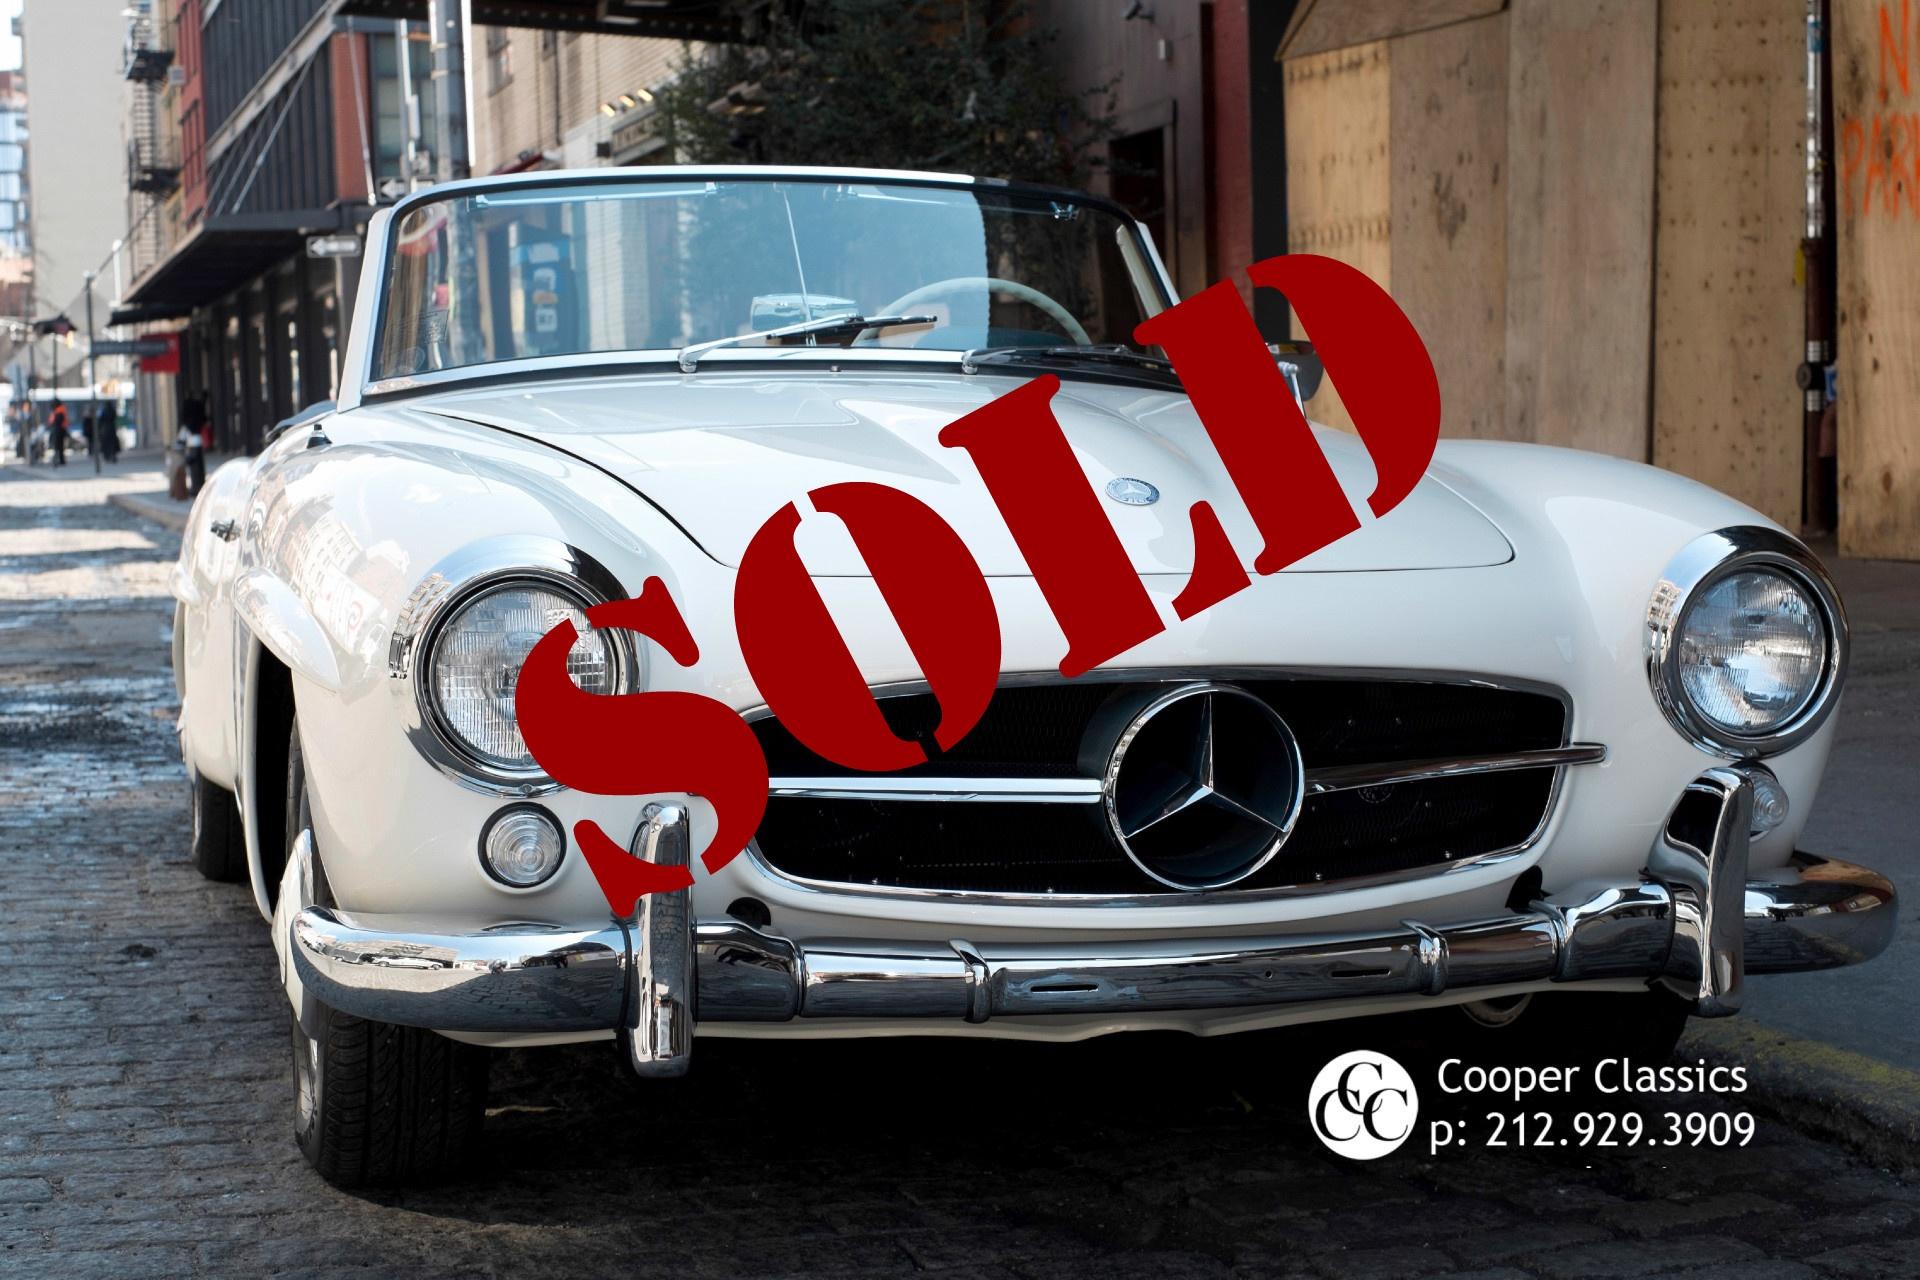 1955 mercedes benz 190sl stock 674 for sale near new york, ny ny 1960 mercedes 190sl used 1955 mercedes benz 190sl